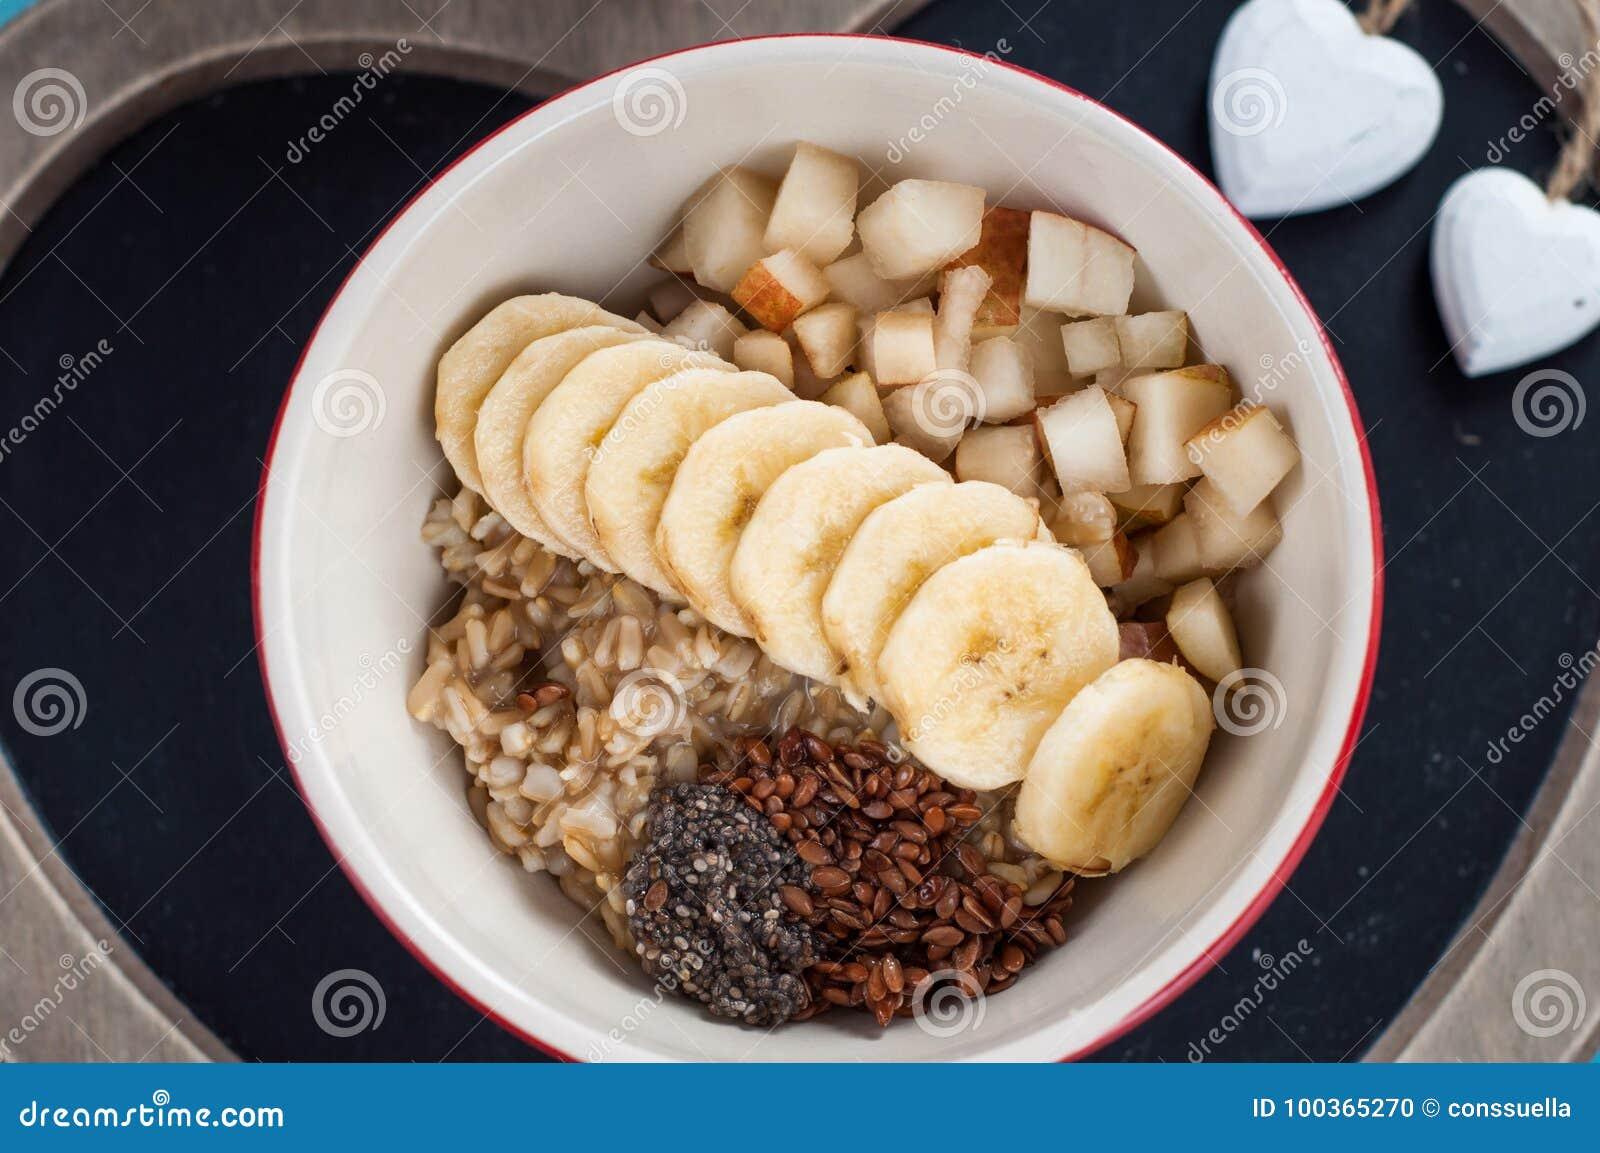 Здоровый завтрак, овсянка, банан, груша, мед, семена льна, семена.